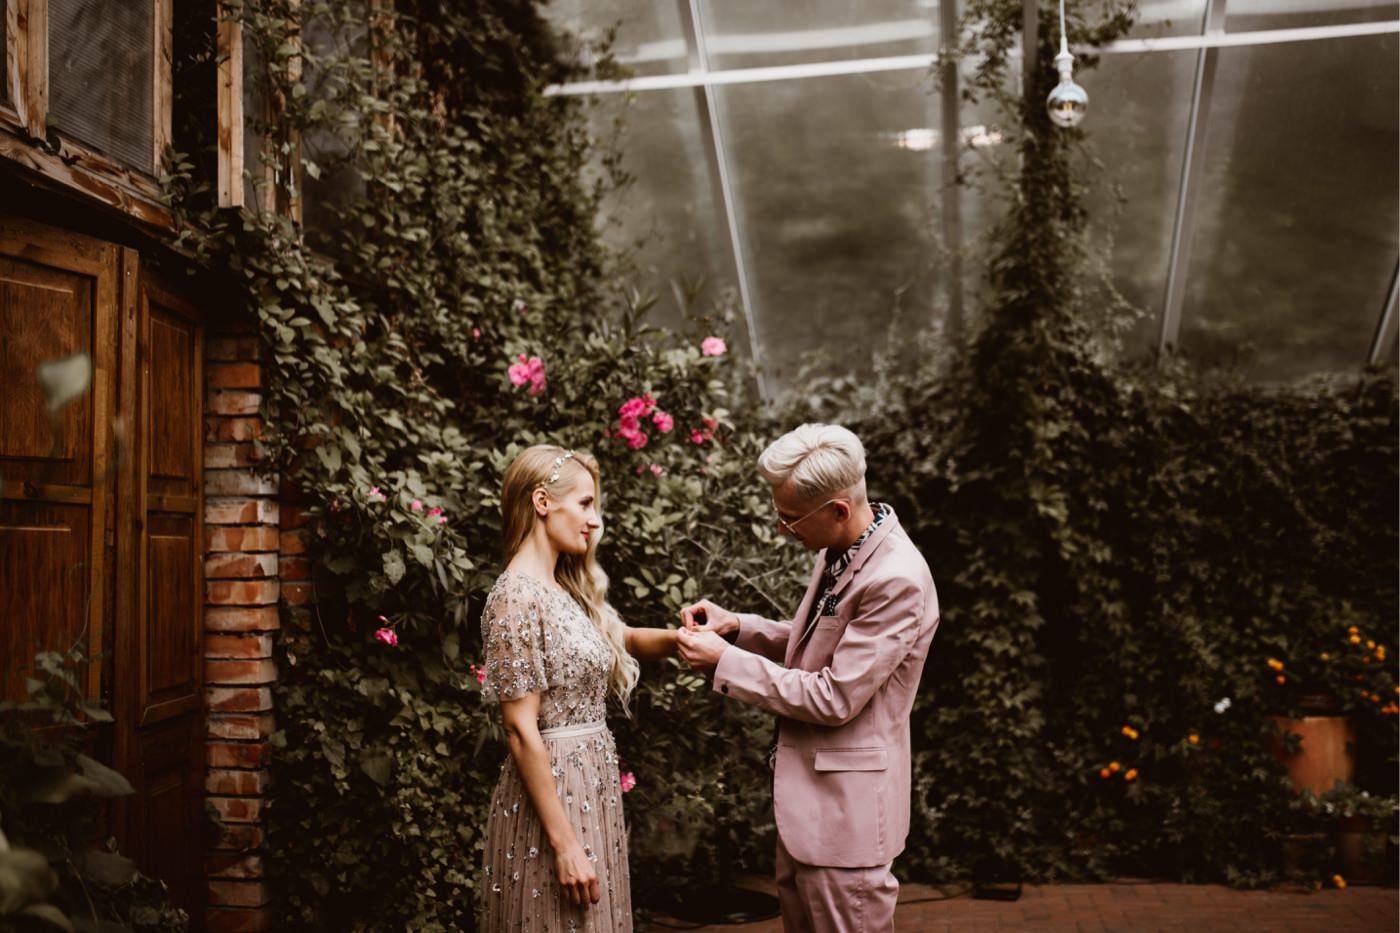 ewelina zieba rustykalne wesele stara oranzeria warszawa 020